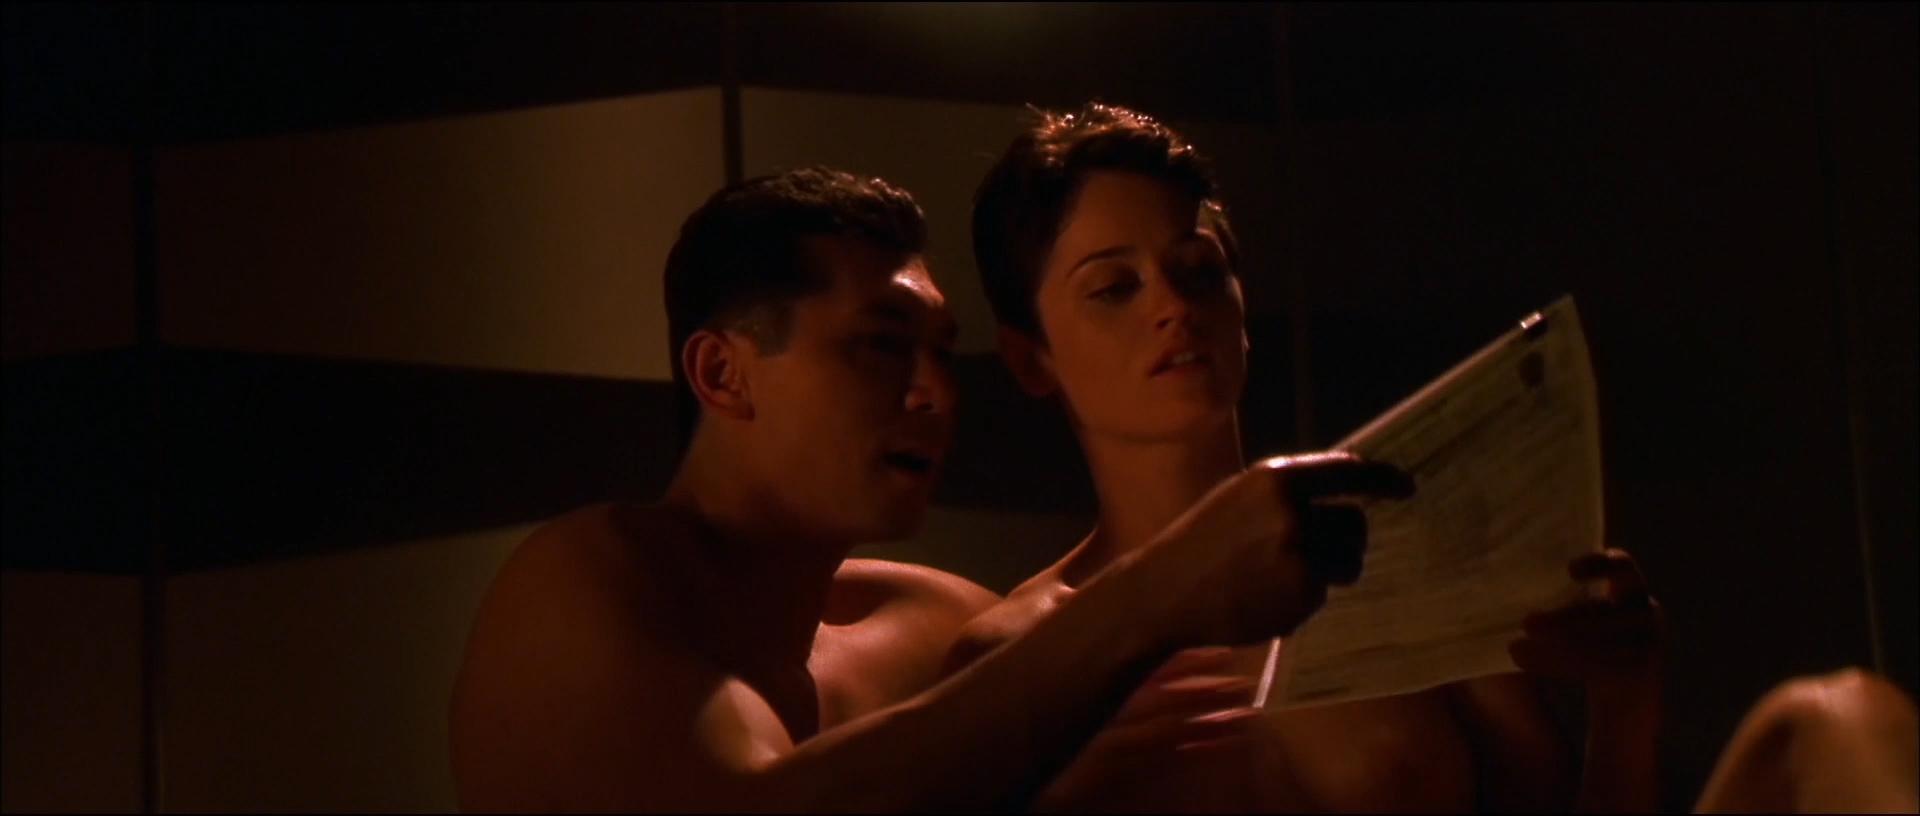 Angela Bassett Nude Pics download sex pics robin tunney nude zero gravity sex and